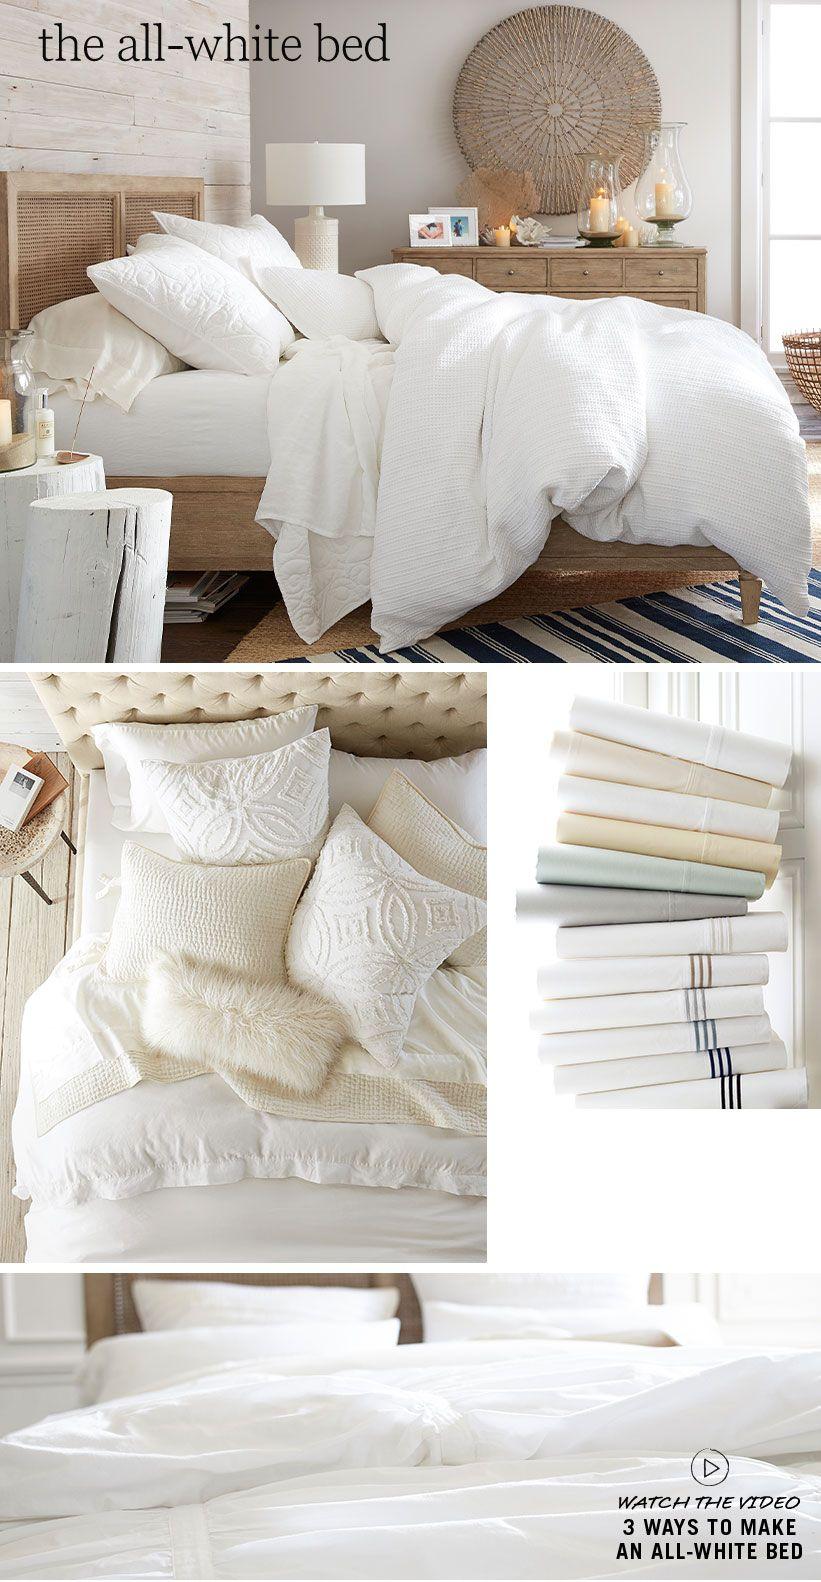 all white bedding  pottery barn. all white bedding  pottery barn  the insides (bedroom